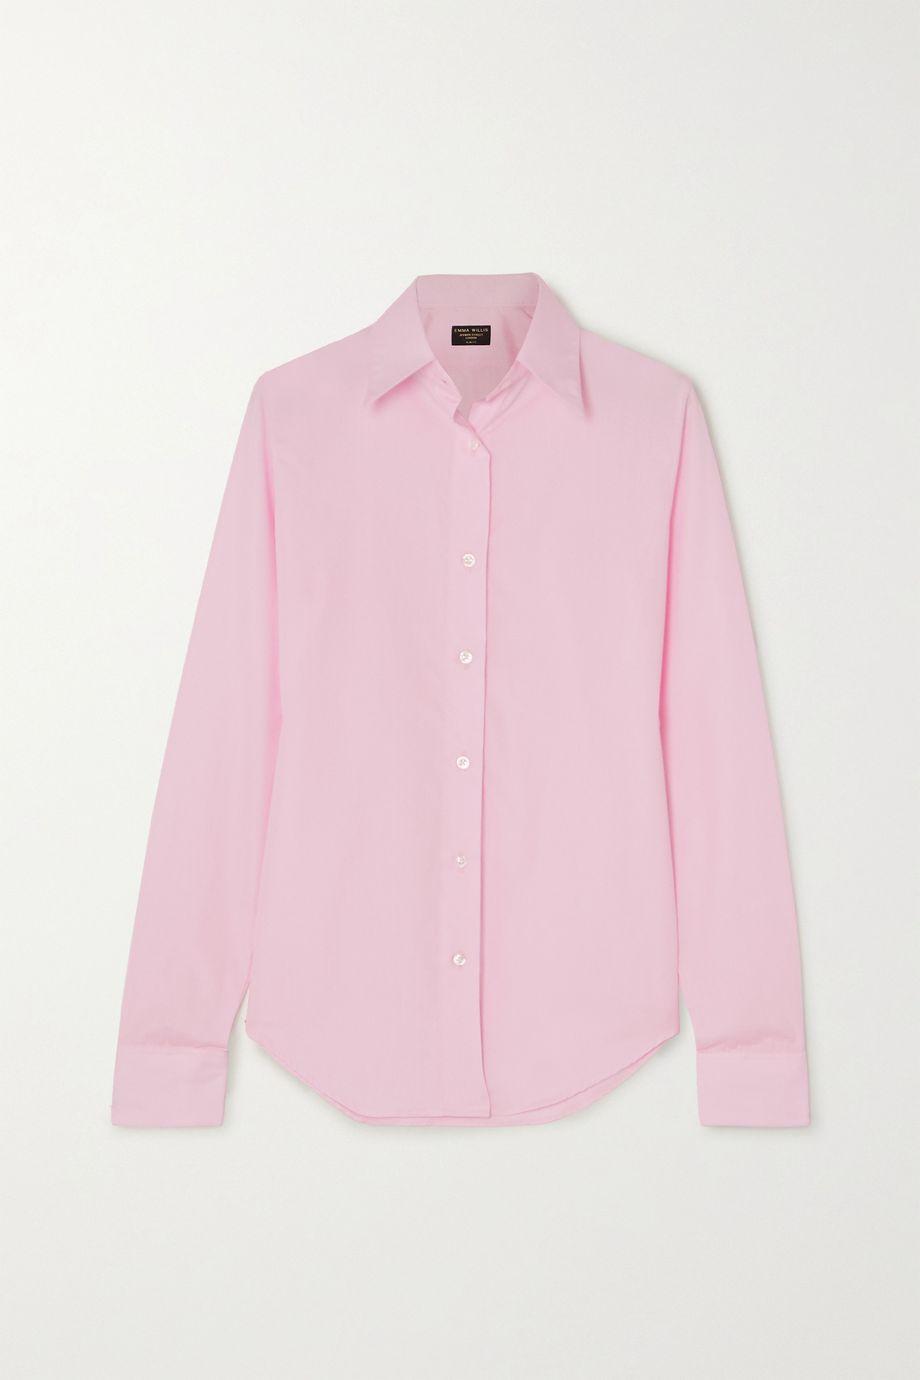 Emma Willis + NET SUSTAIN Superior cotton-poplin shirt